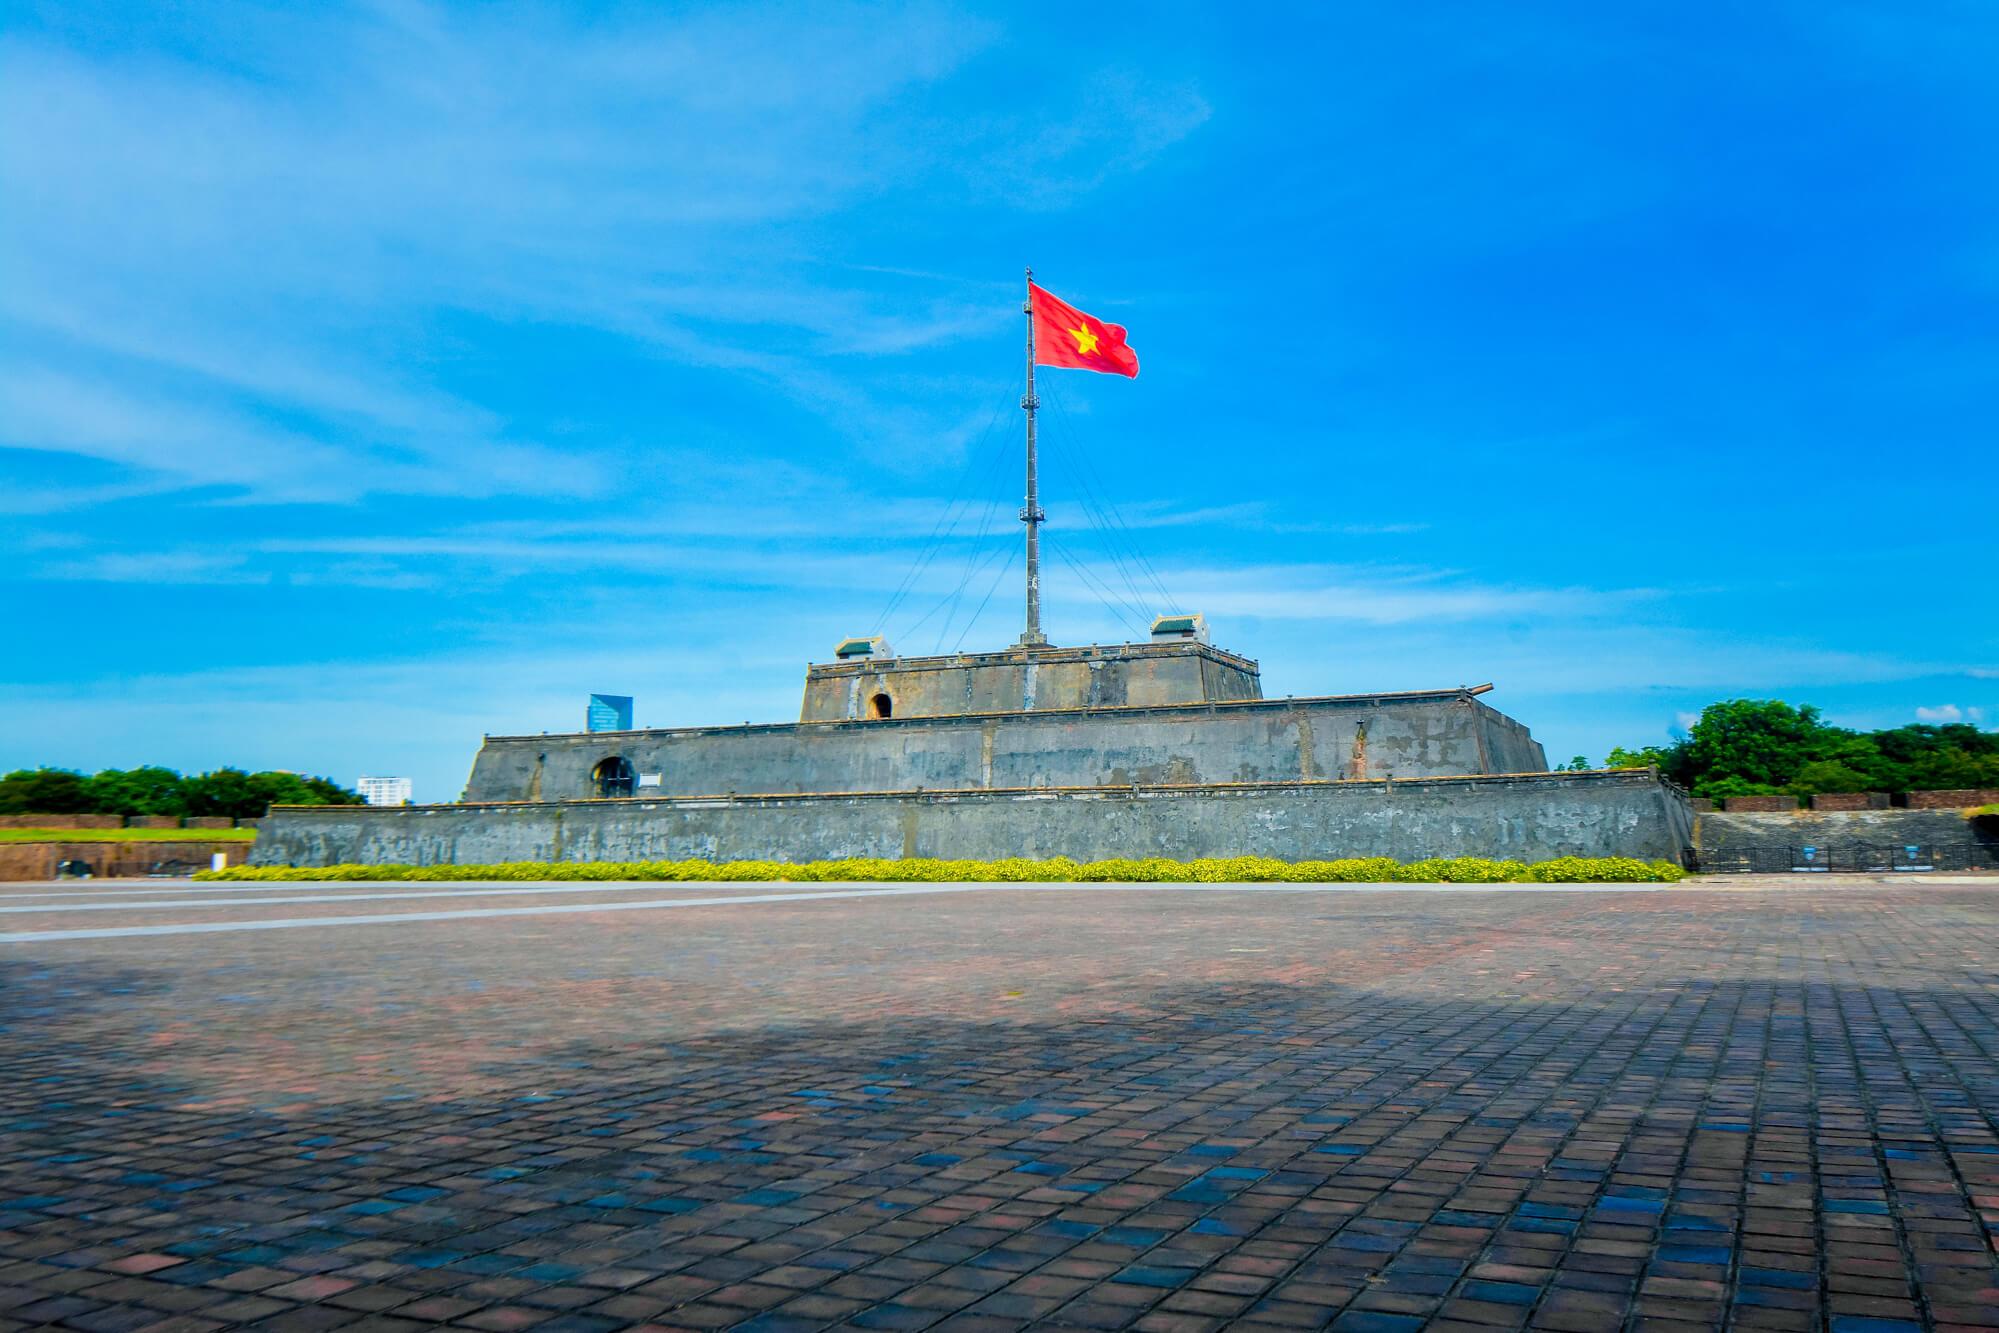 Hue Citadel - Square